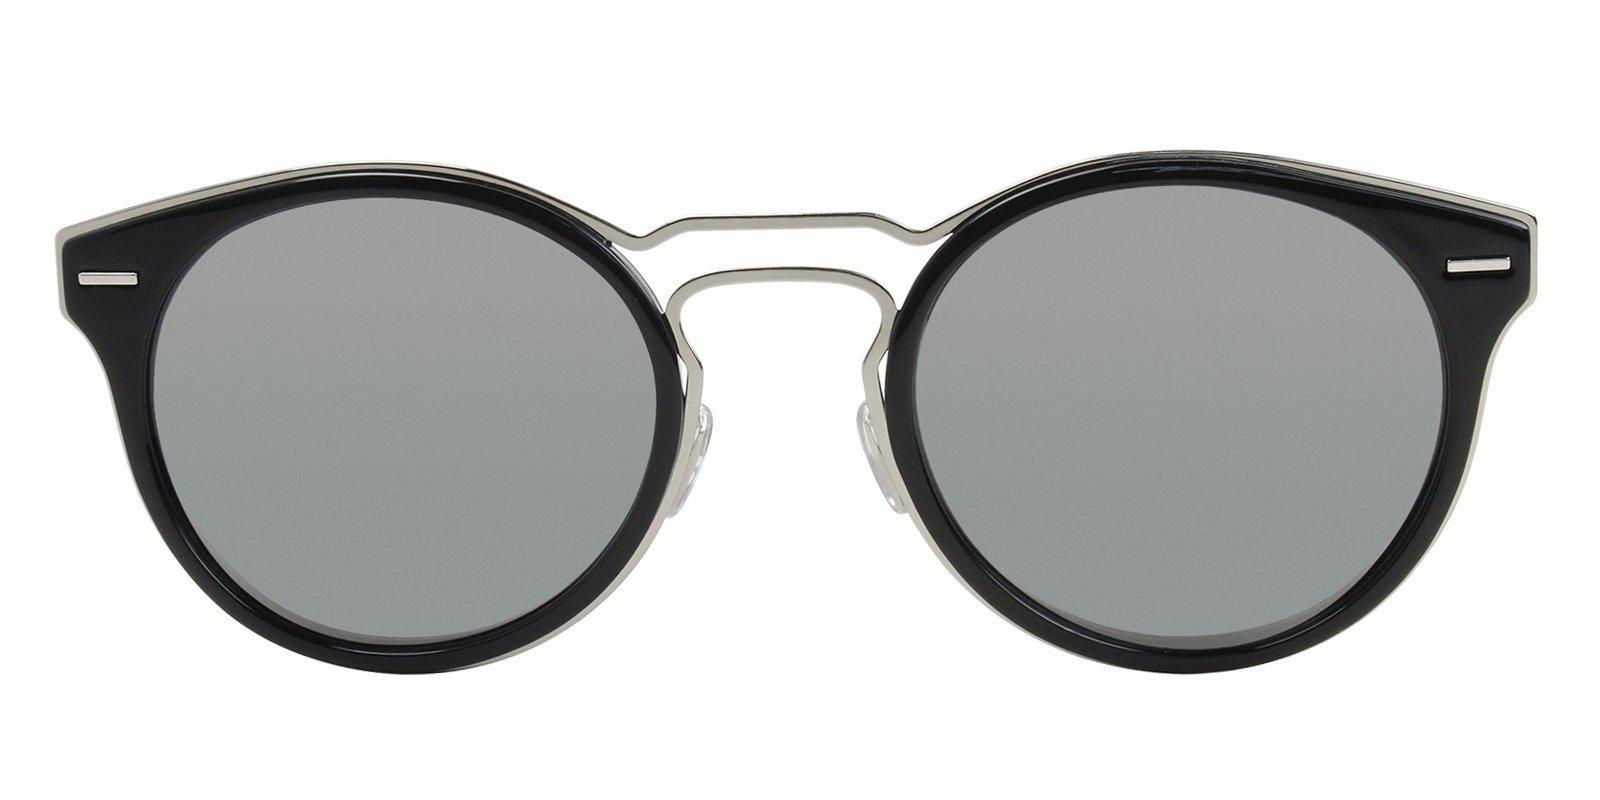 1424f4f5d7 Dior Homme - Dior 0209S Black - Gray Sunglasses